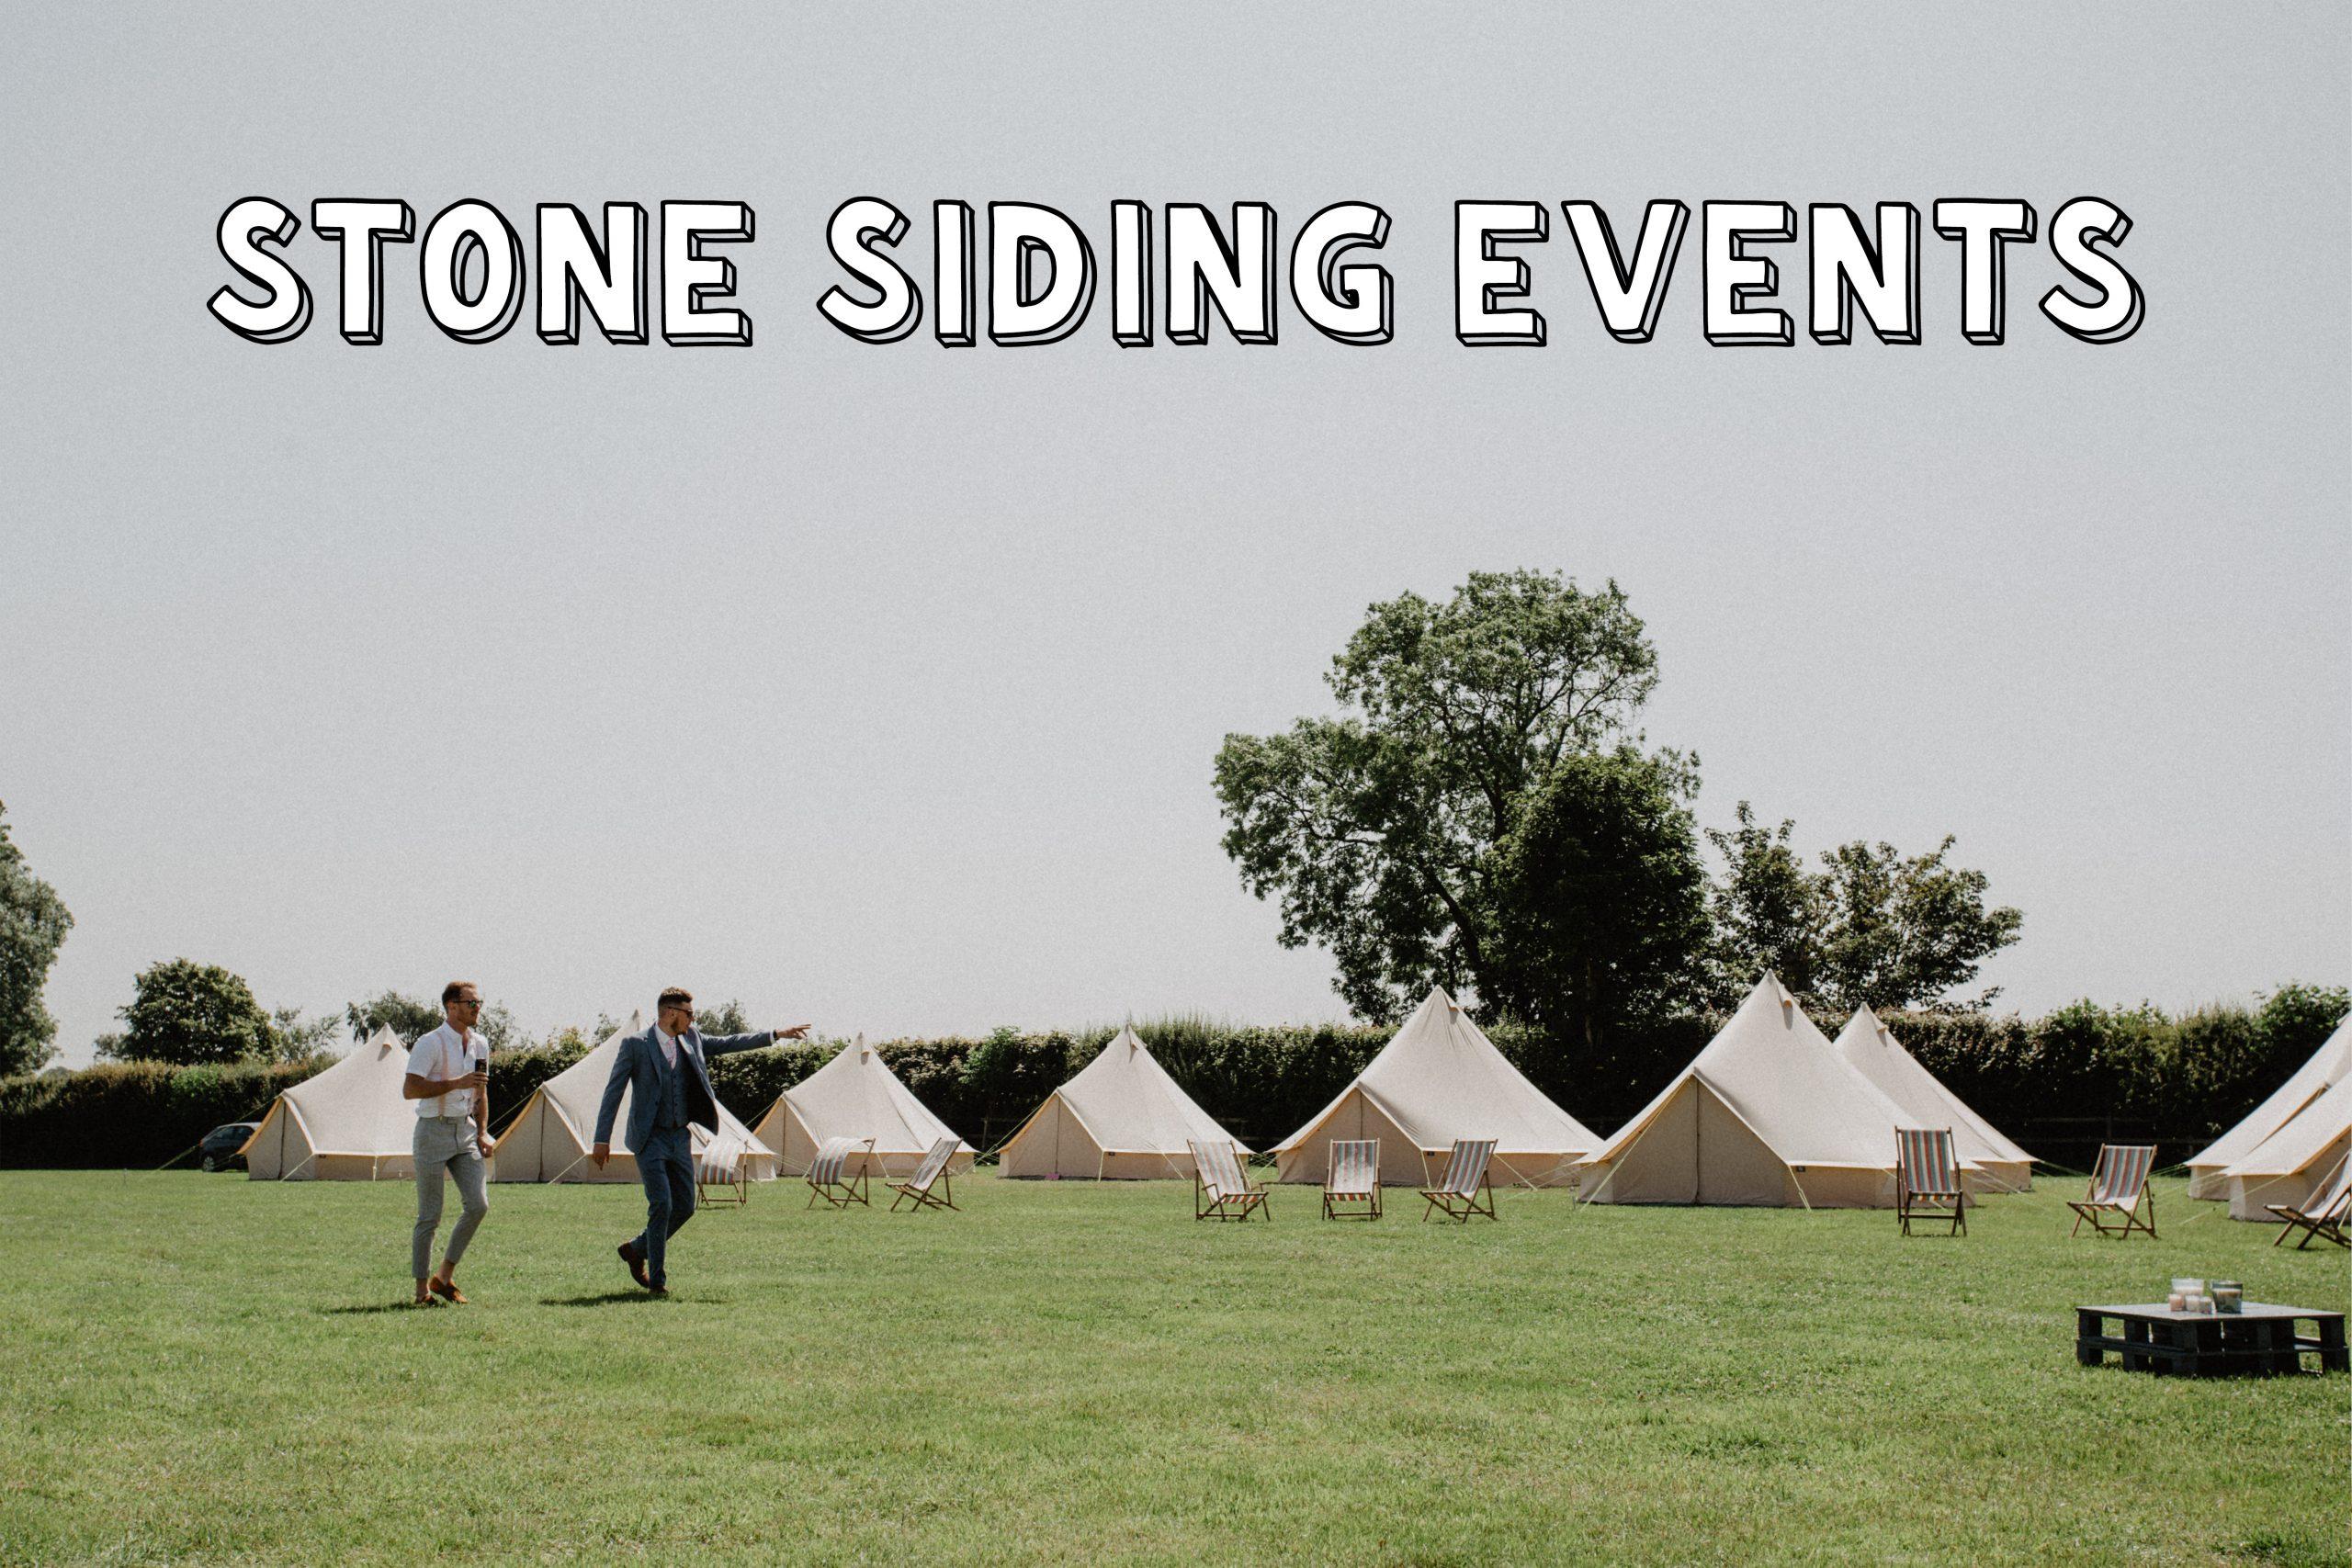 tipi wedding venue, Tipi Wedding Venues | Fully Inclusive Tipi Wedding Packages